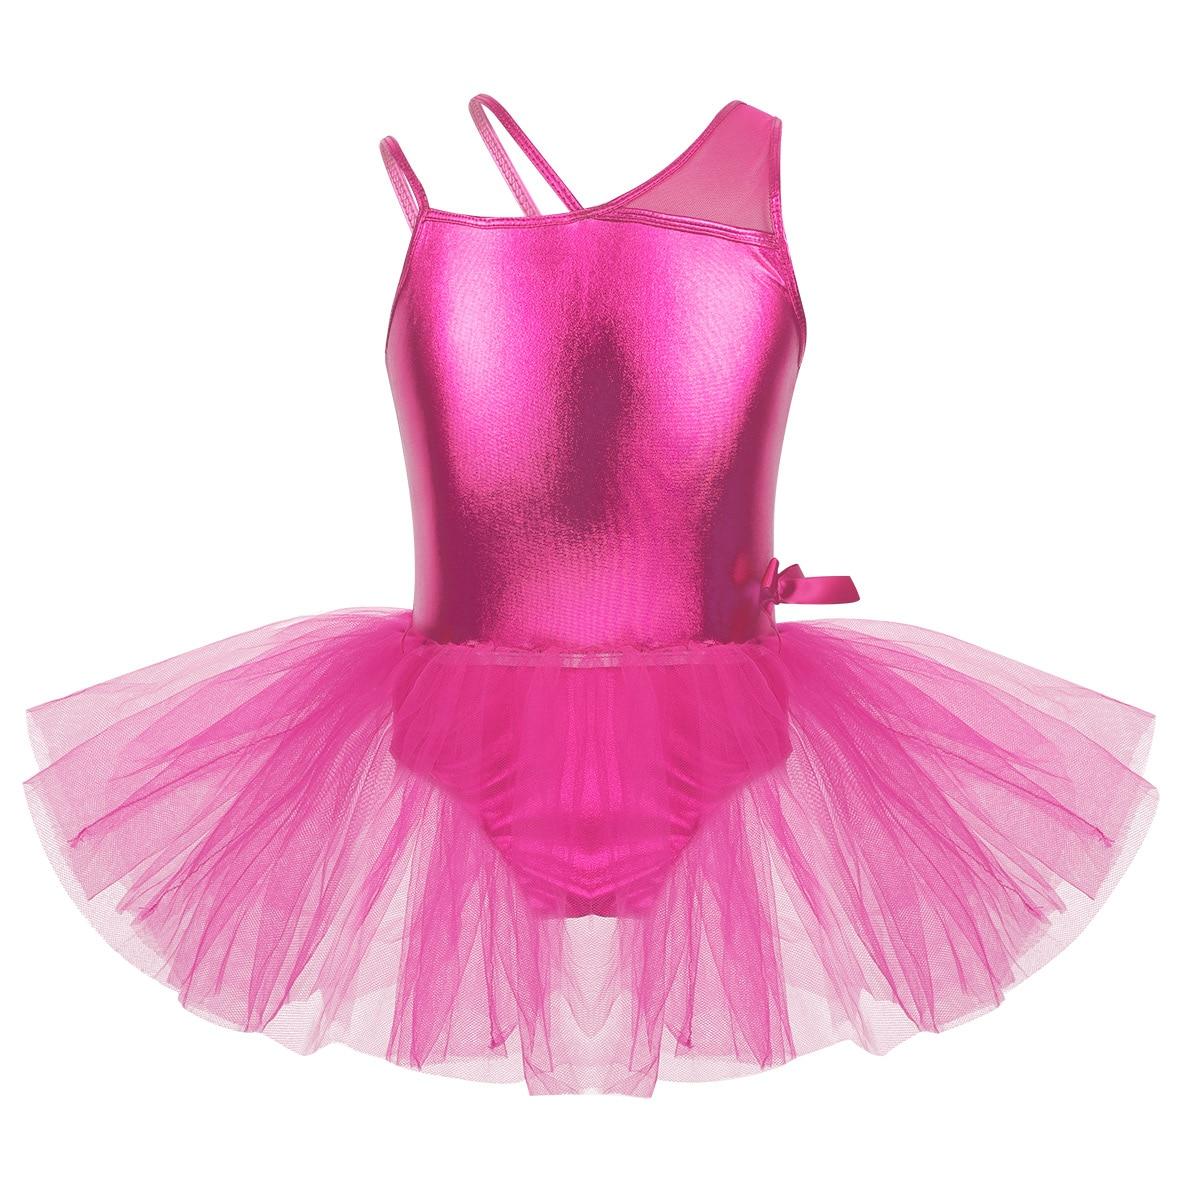 Girls Sequin Ballet Tutu Dress Kid Leotard Skirt Gymnastics One Shoulder Costume